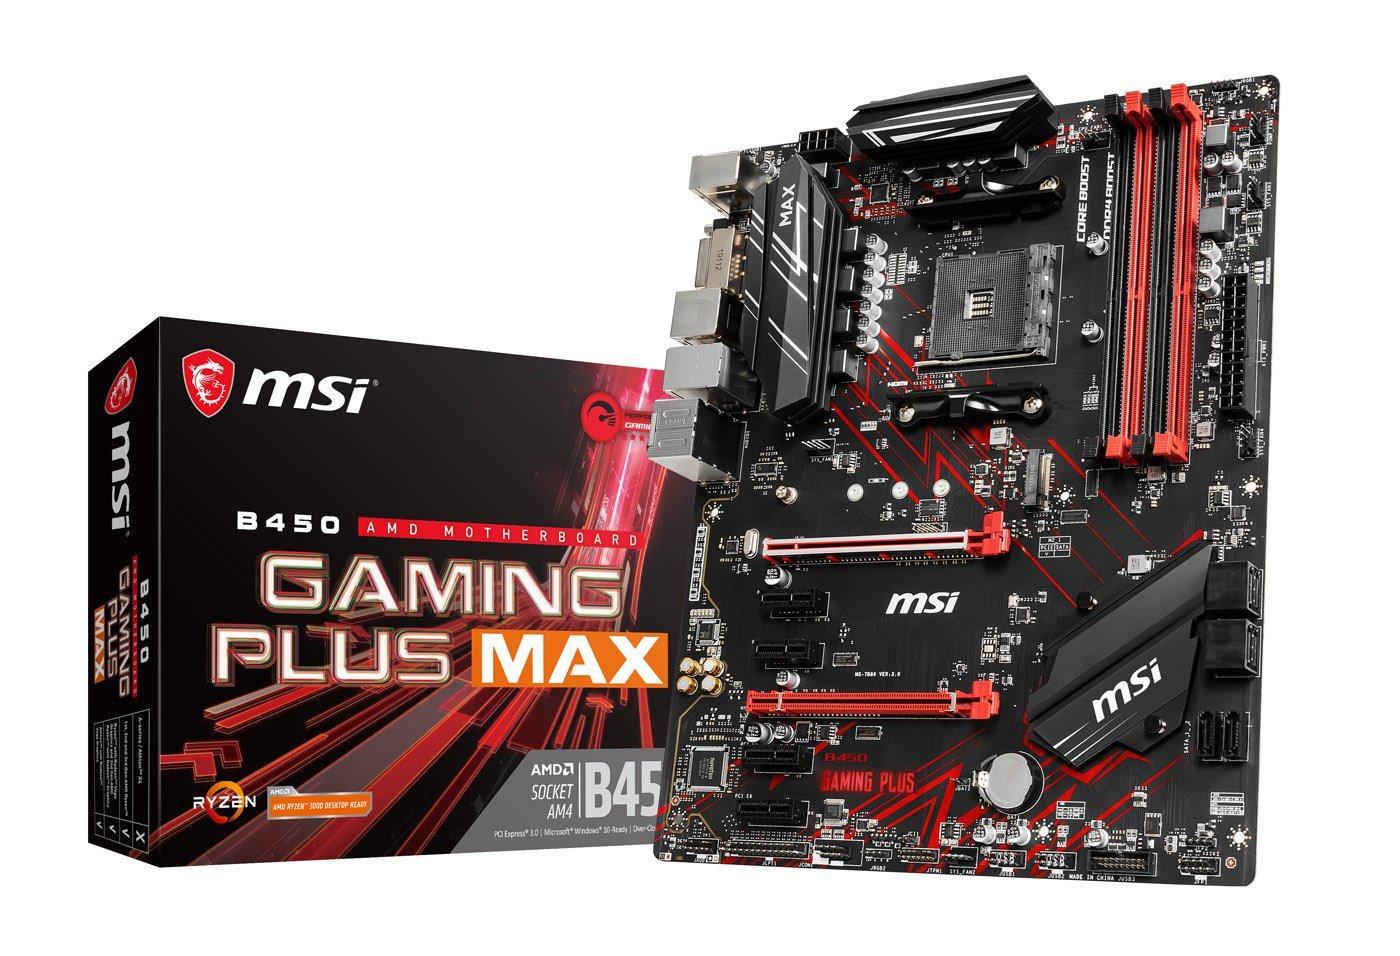 MSI B450 Gaming Plus MAX ATX AM4 Motherboard